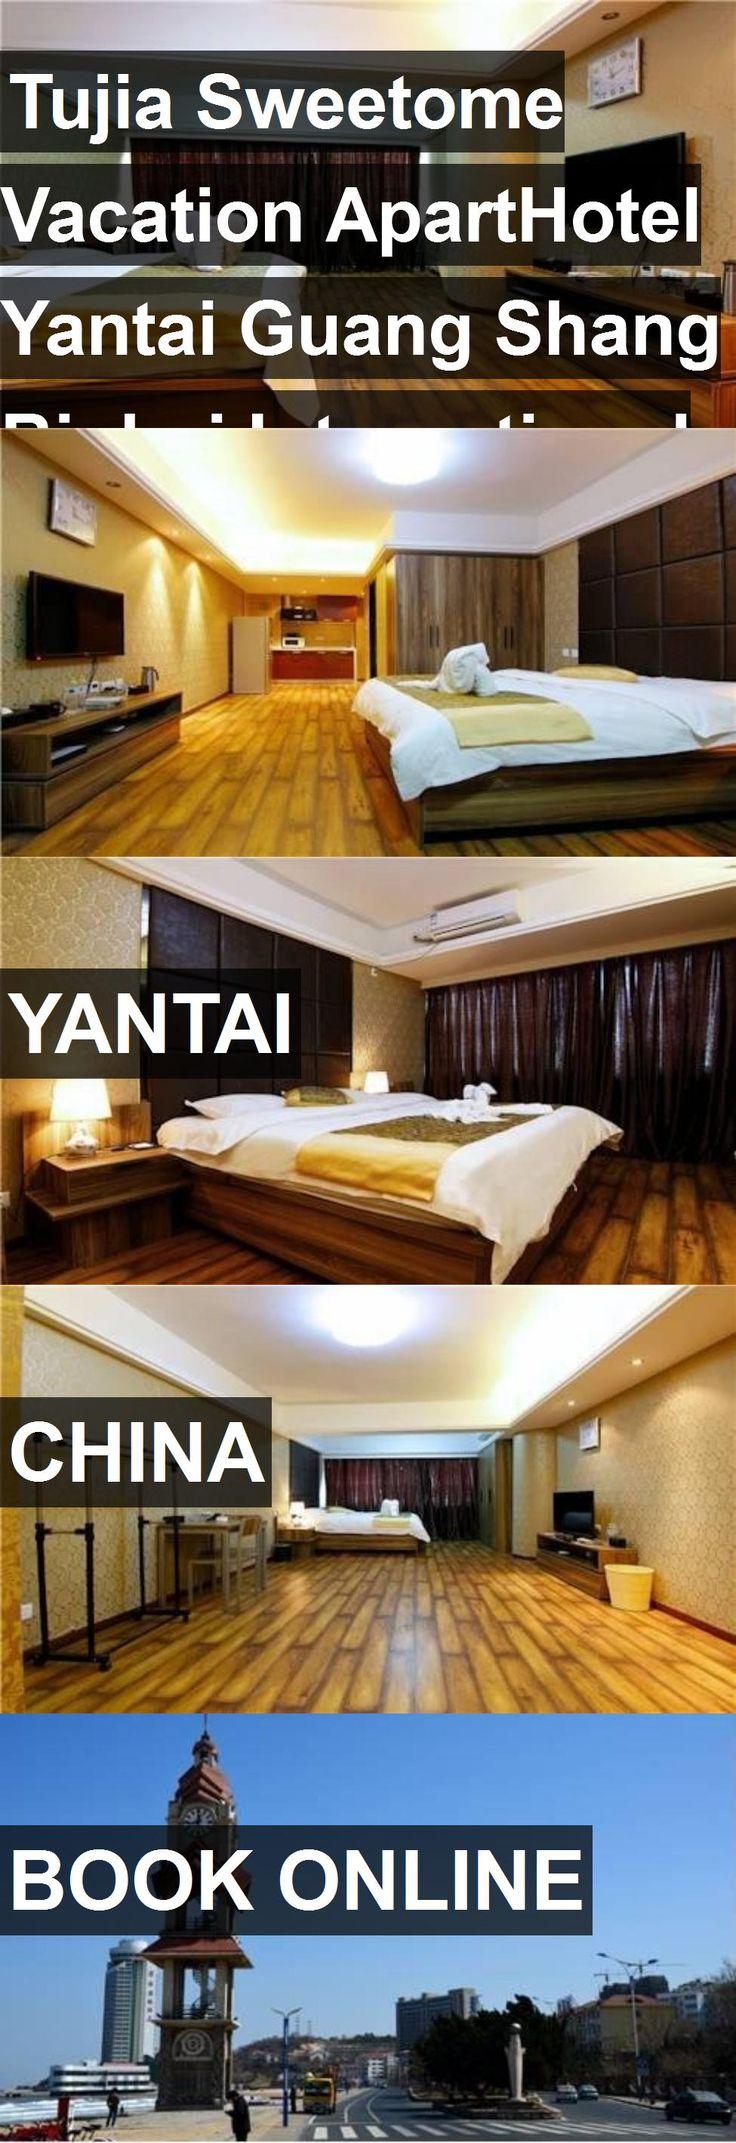 Tujia Sweetome Vacation ApartHotel Yantai Guang Shang Binhai International Mansion in Yantai, China. For more information, photos, reviews and best prices please follow the link. #China #Yantai #travel #vacation #hotel